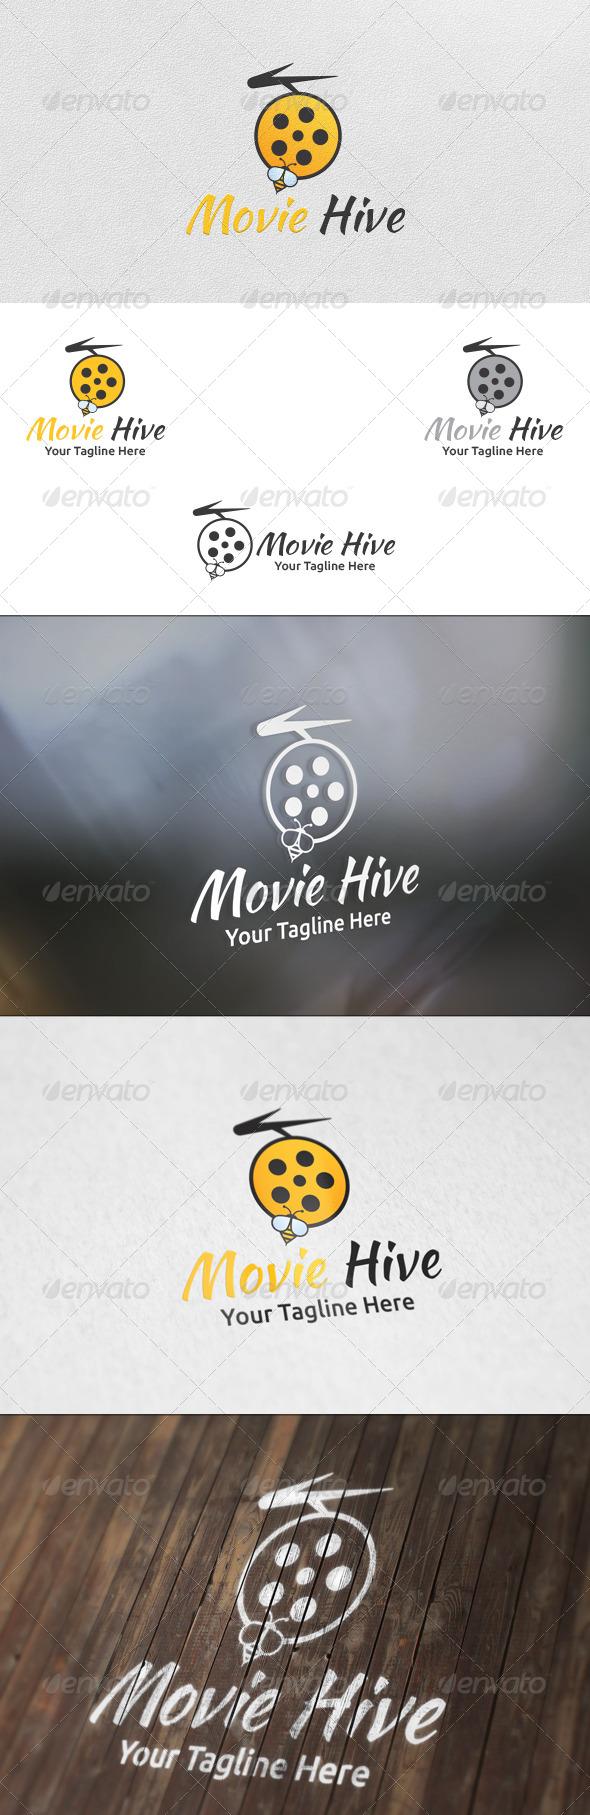 Movie Hive - Logo Template